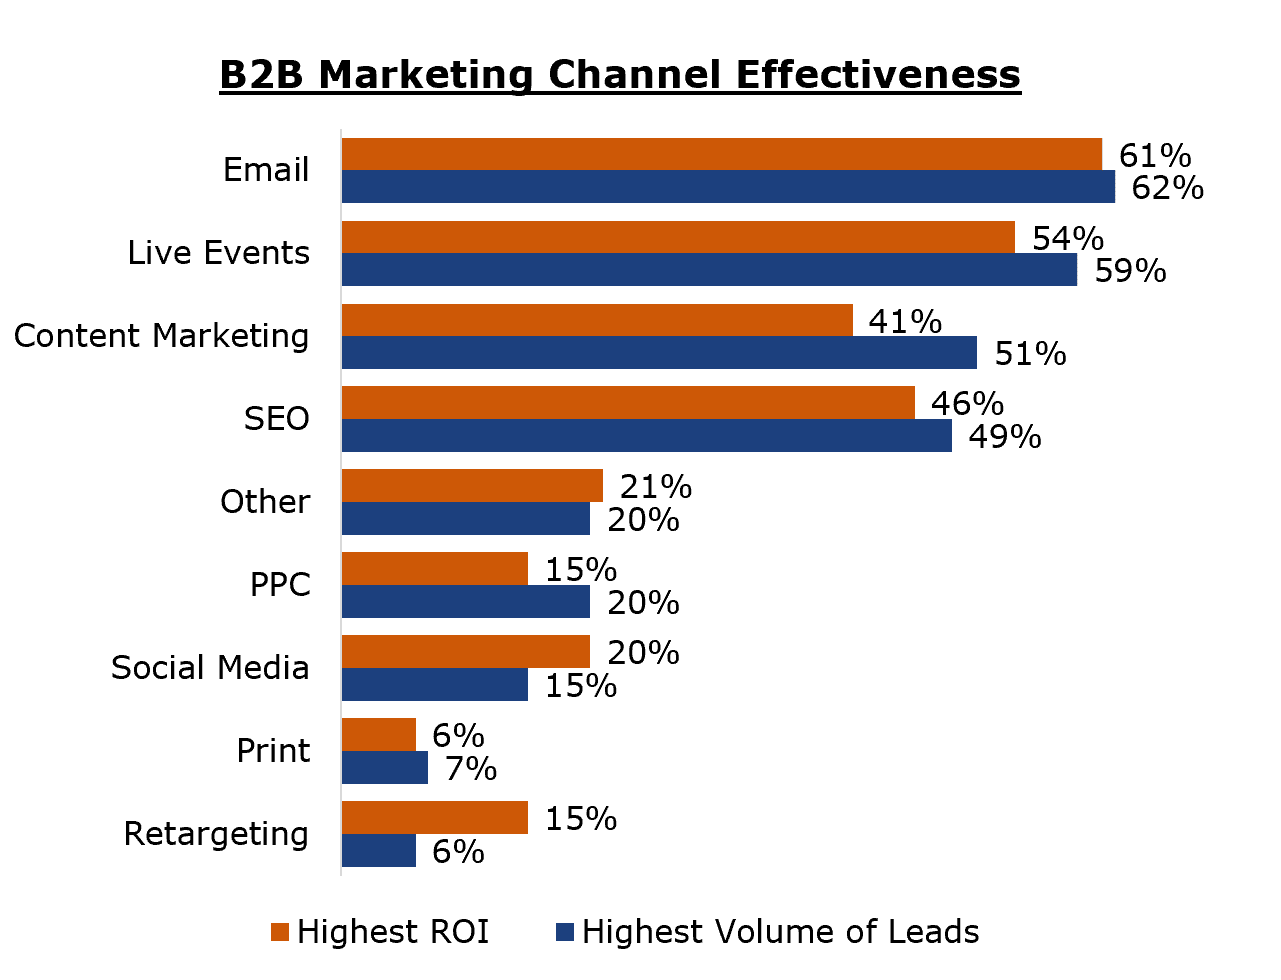 B2B Marketing Channel Effectiveness